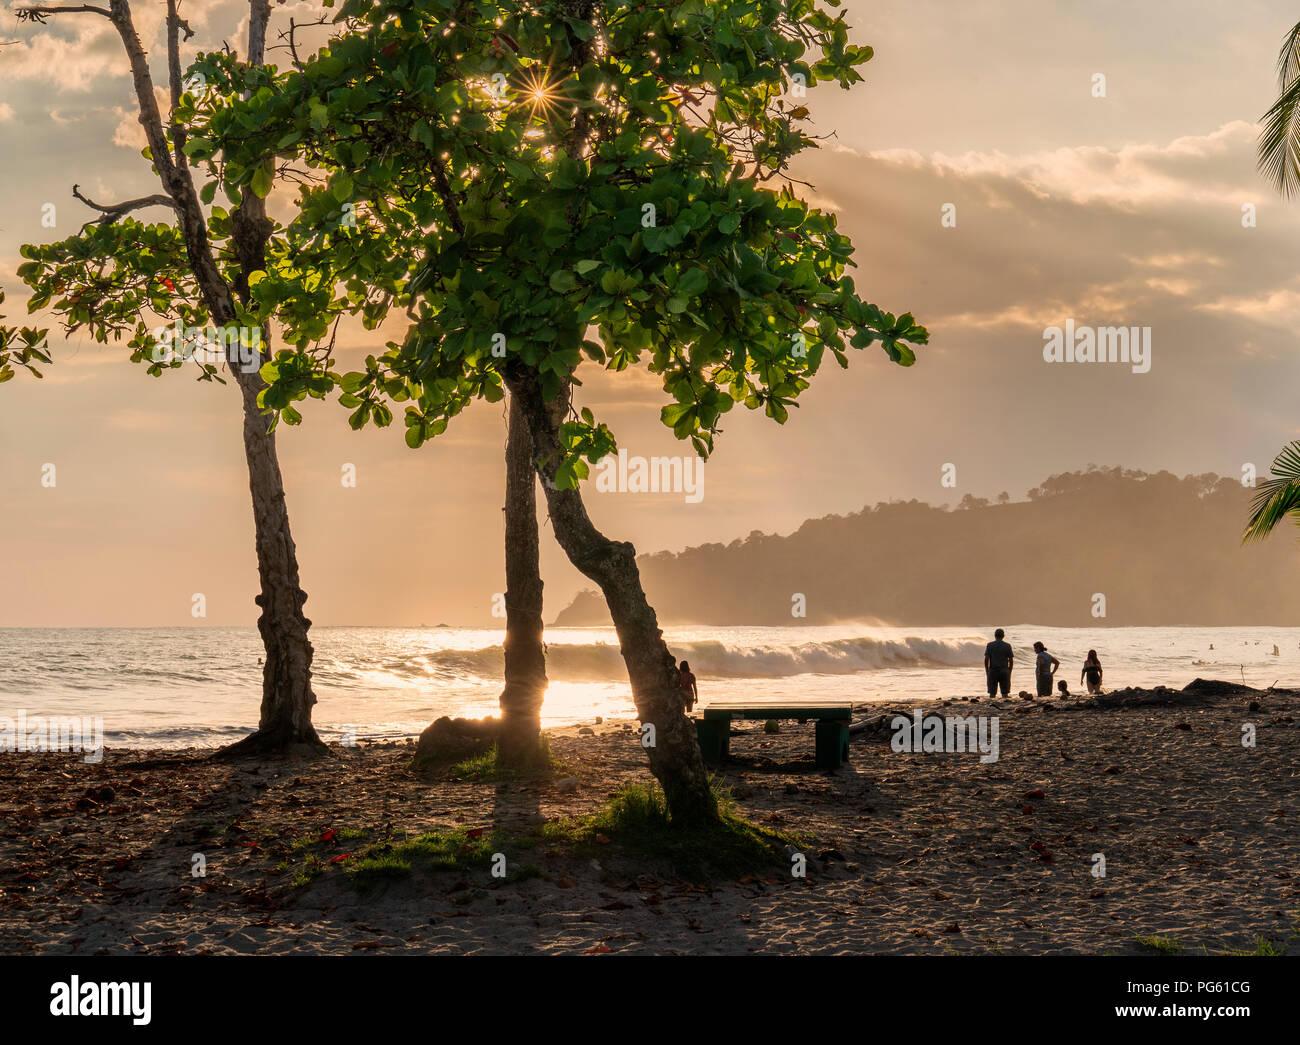 Playa, Parque Nacional Corcovado, Península de Osa, Costa Rica. Foto de stock